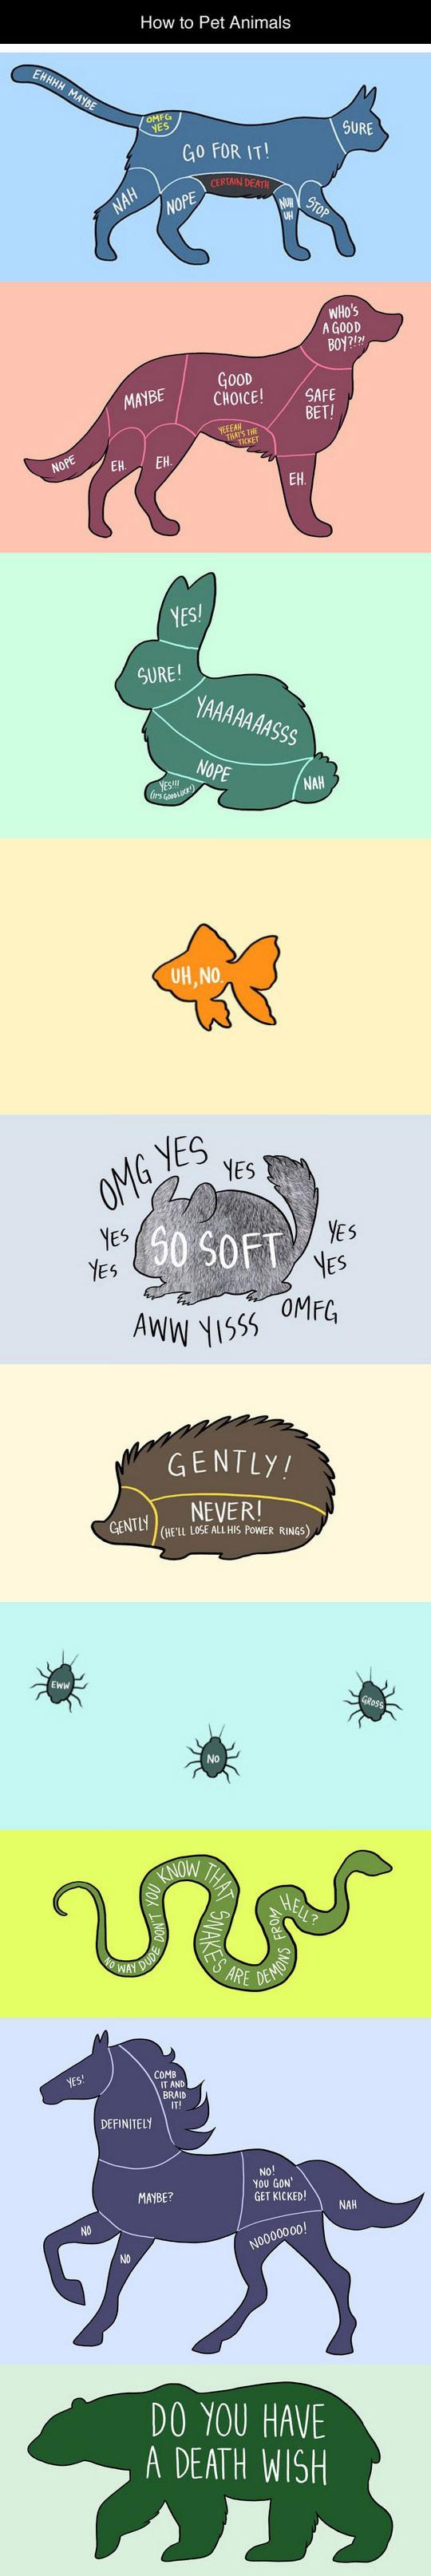 How To Pet Animals